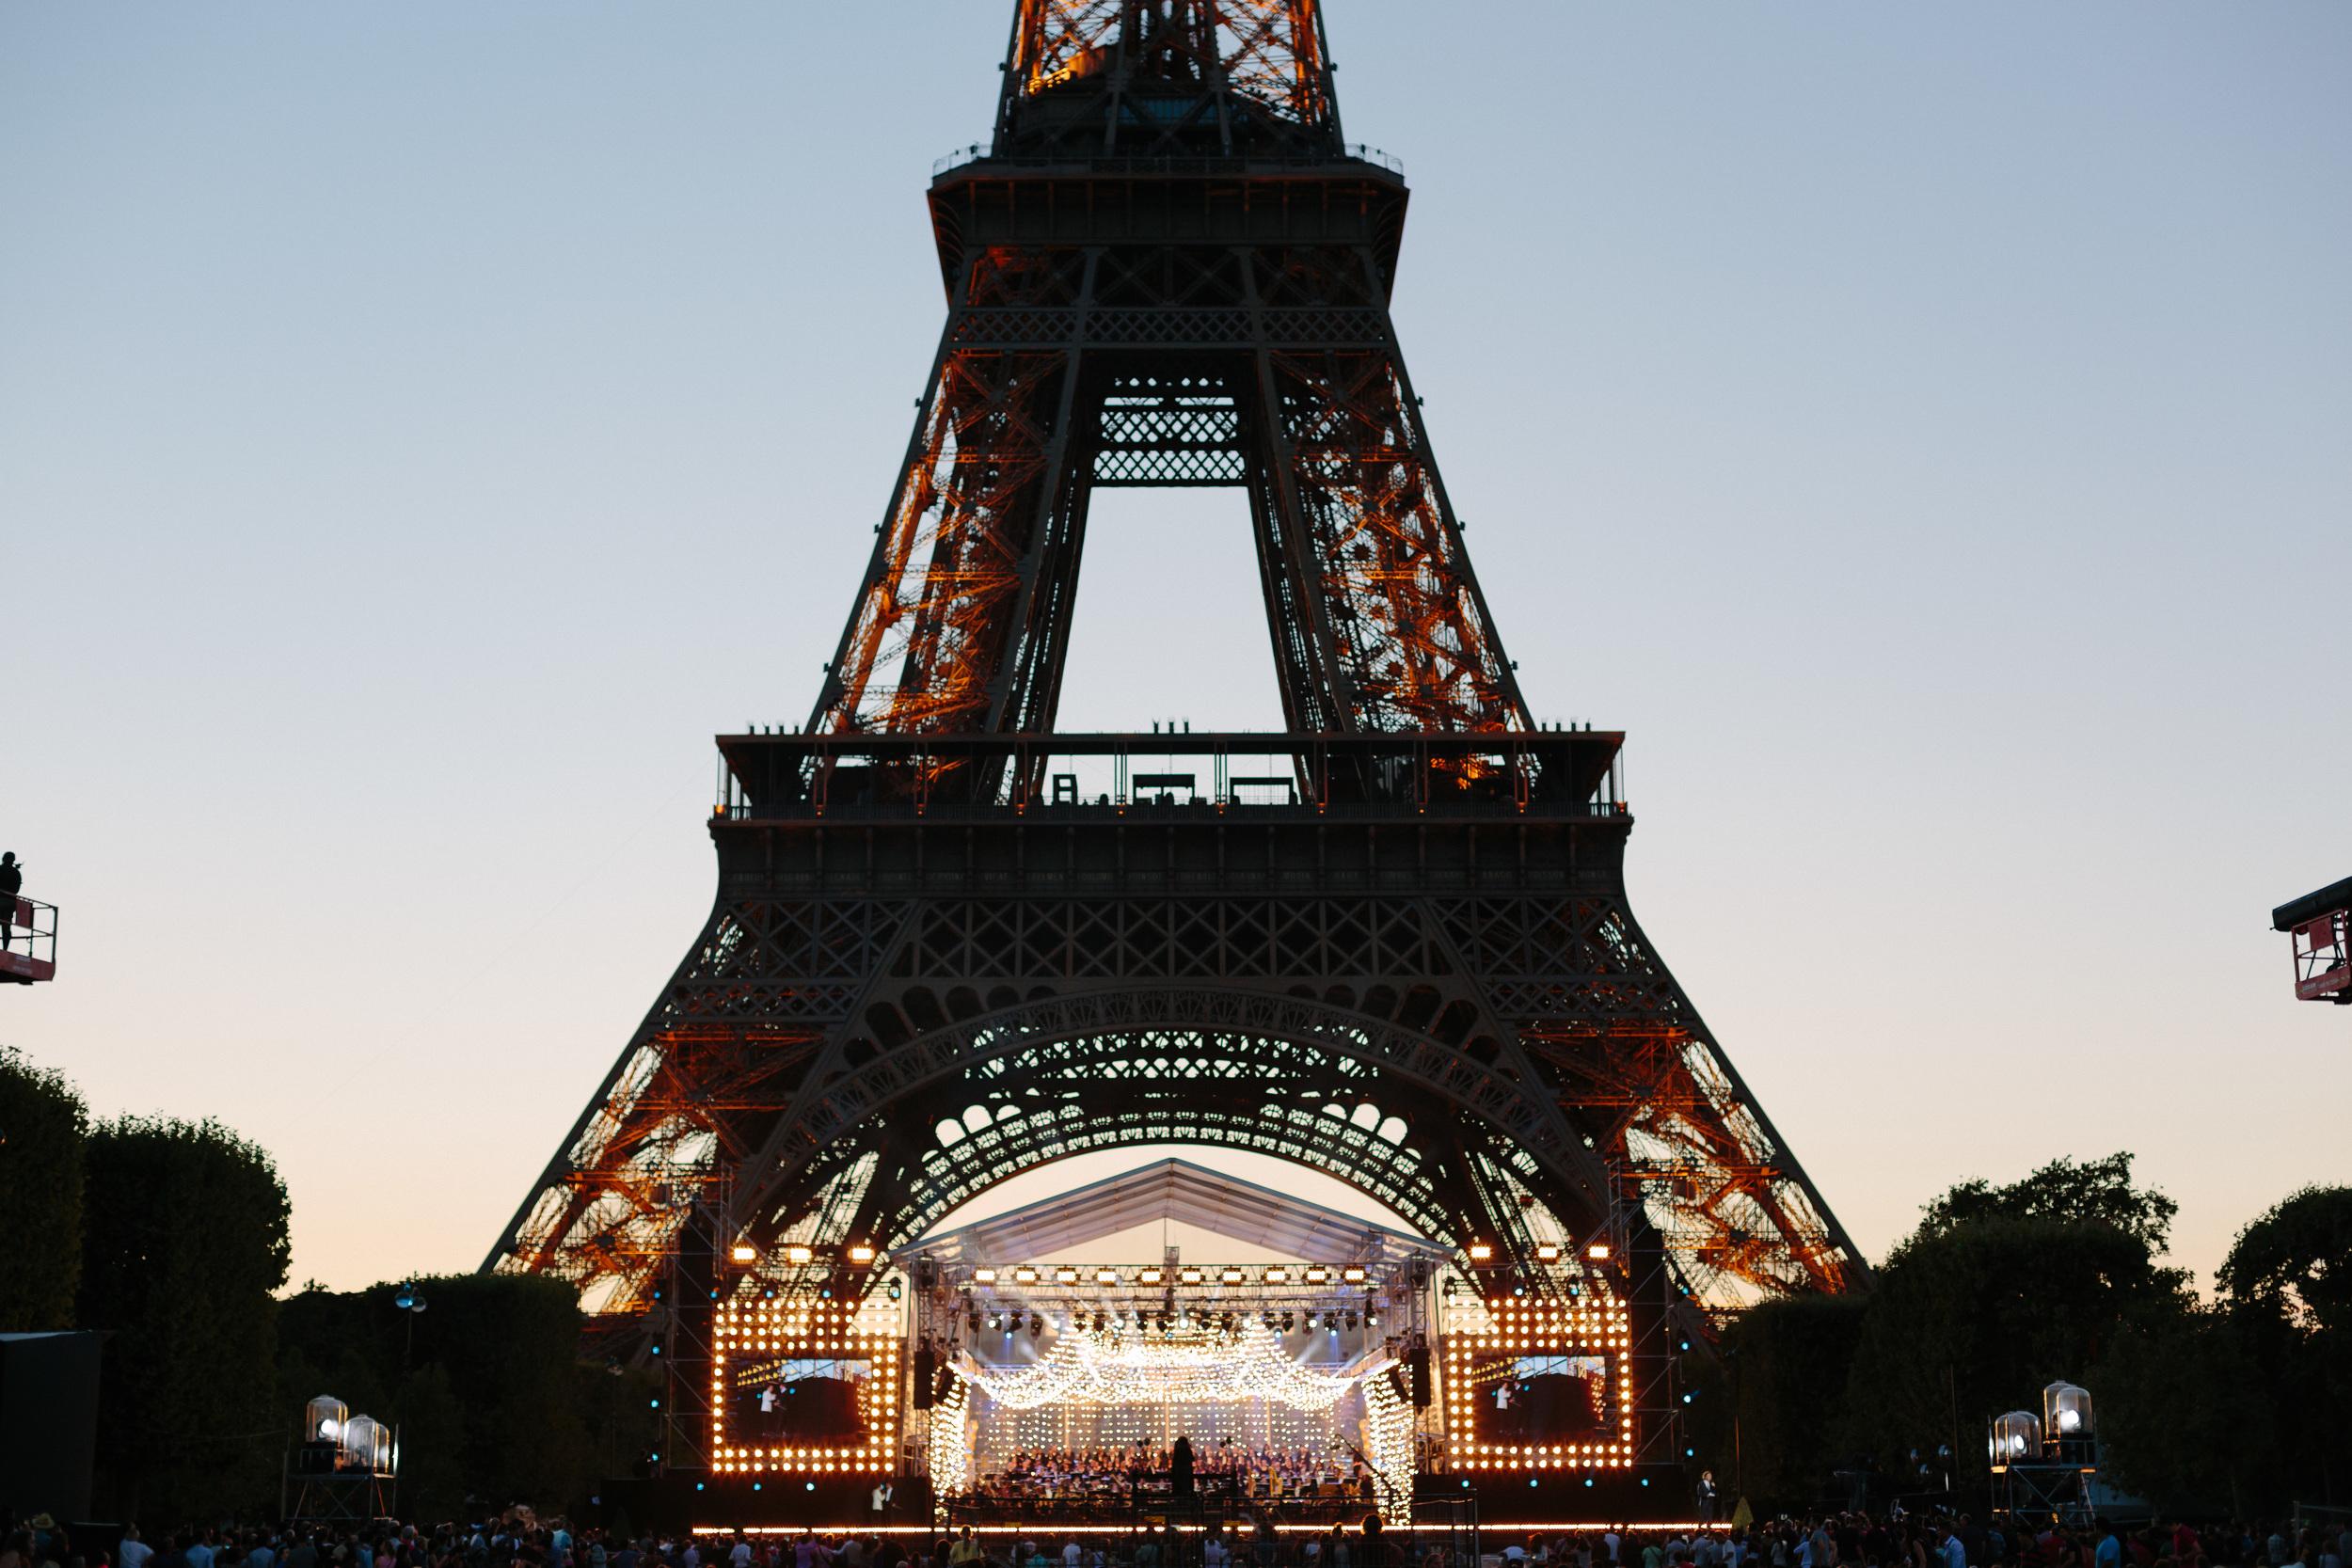 Photographer in Paris, Fireworks, 14 juillet, 14 July, Bastille2015, Tour Eiffel, Iheartparisfr